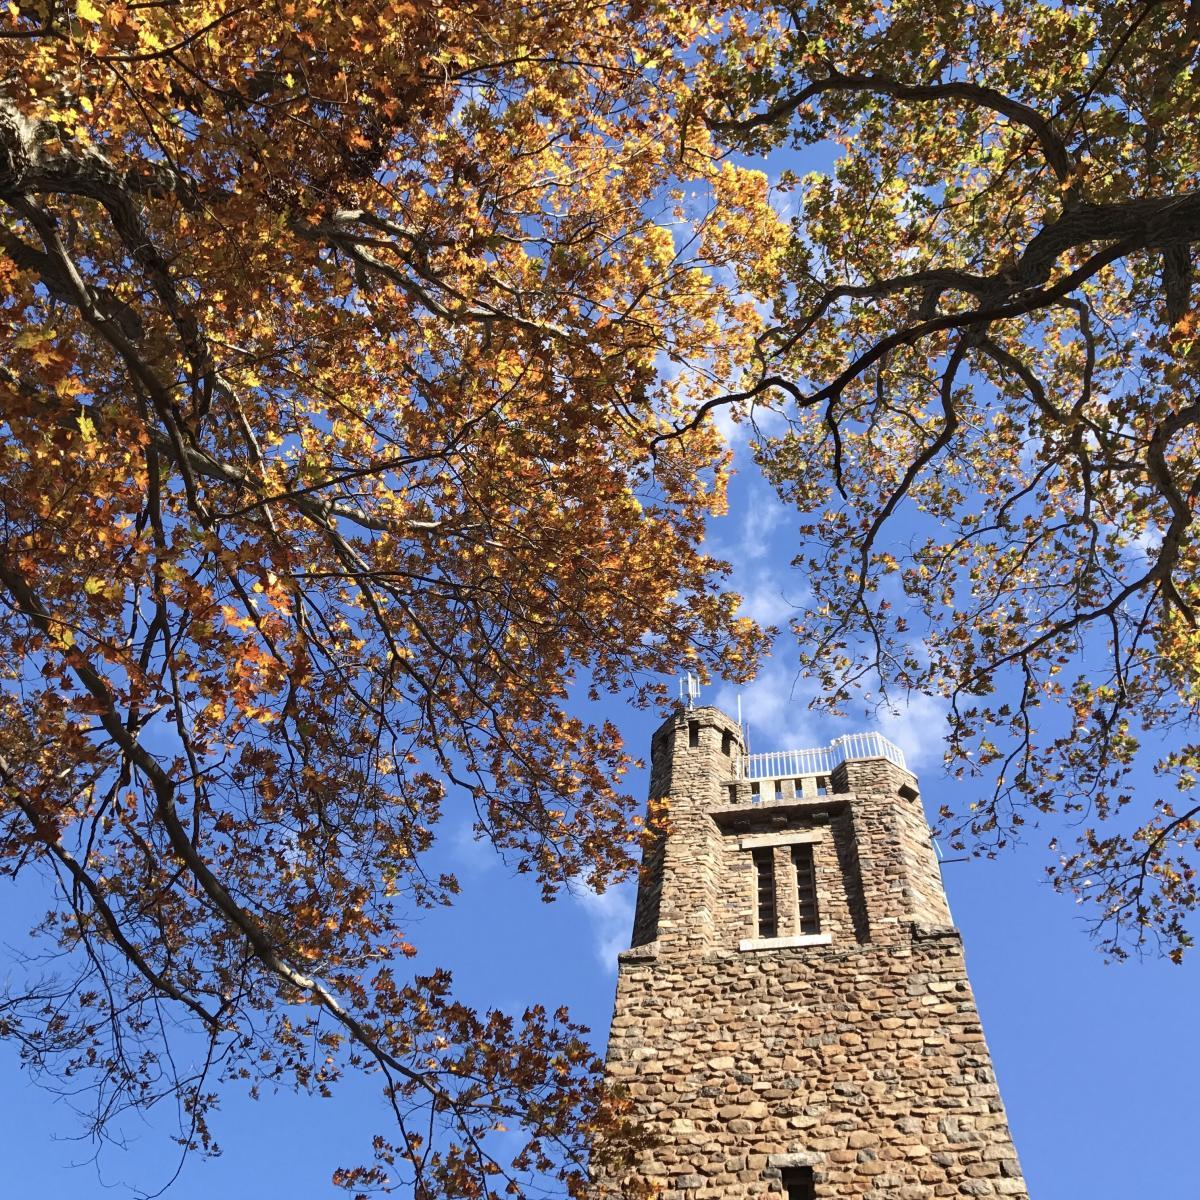 Fall at Bowman's Hill Tower